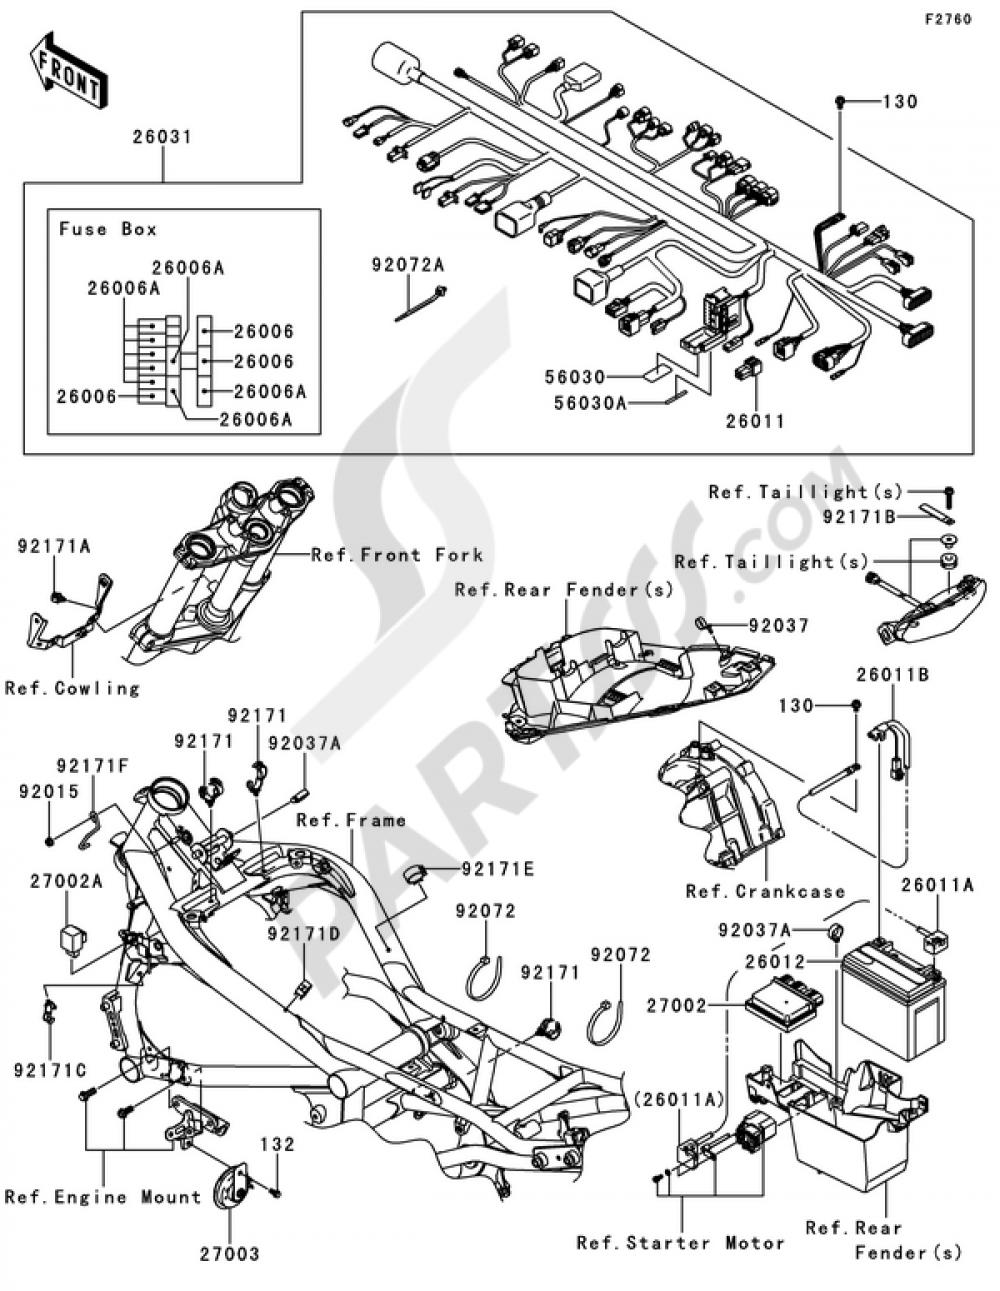 chassis electrical equipment kawasaki er